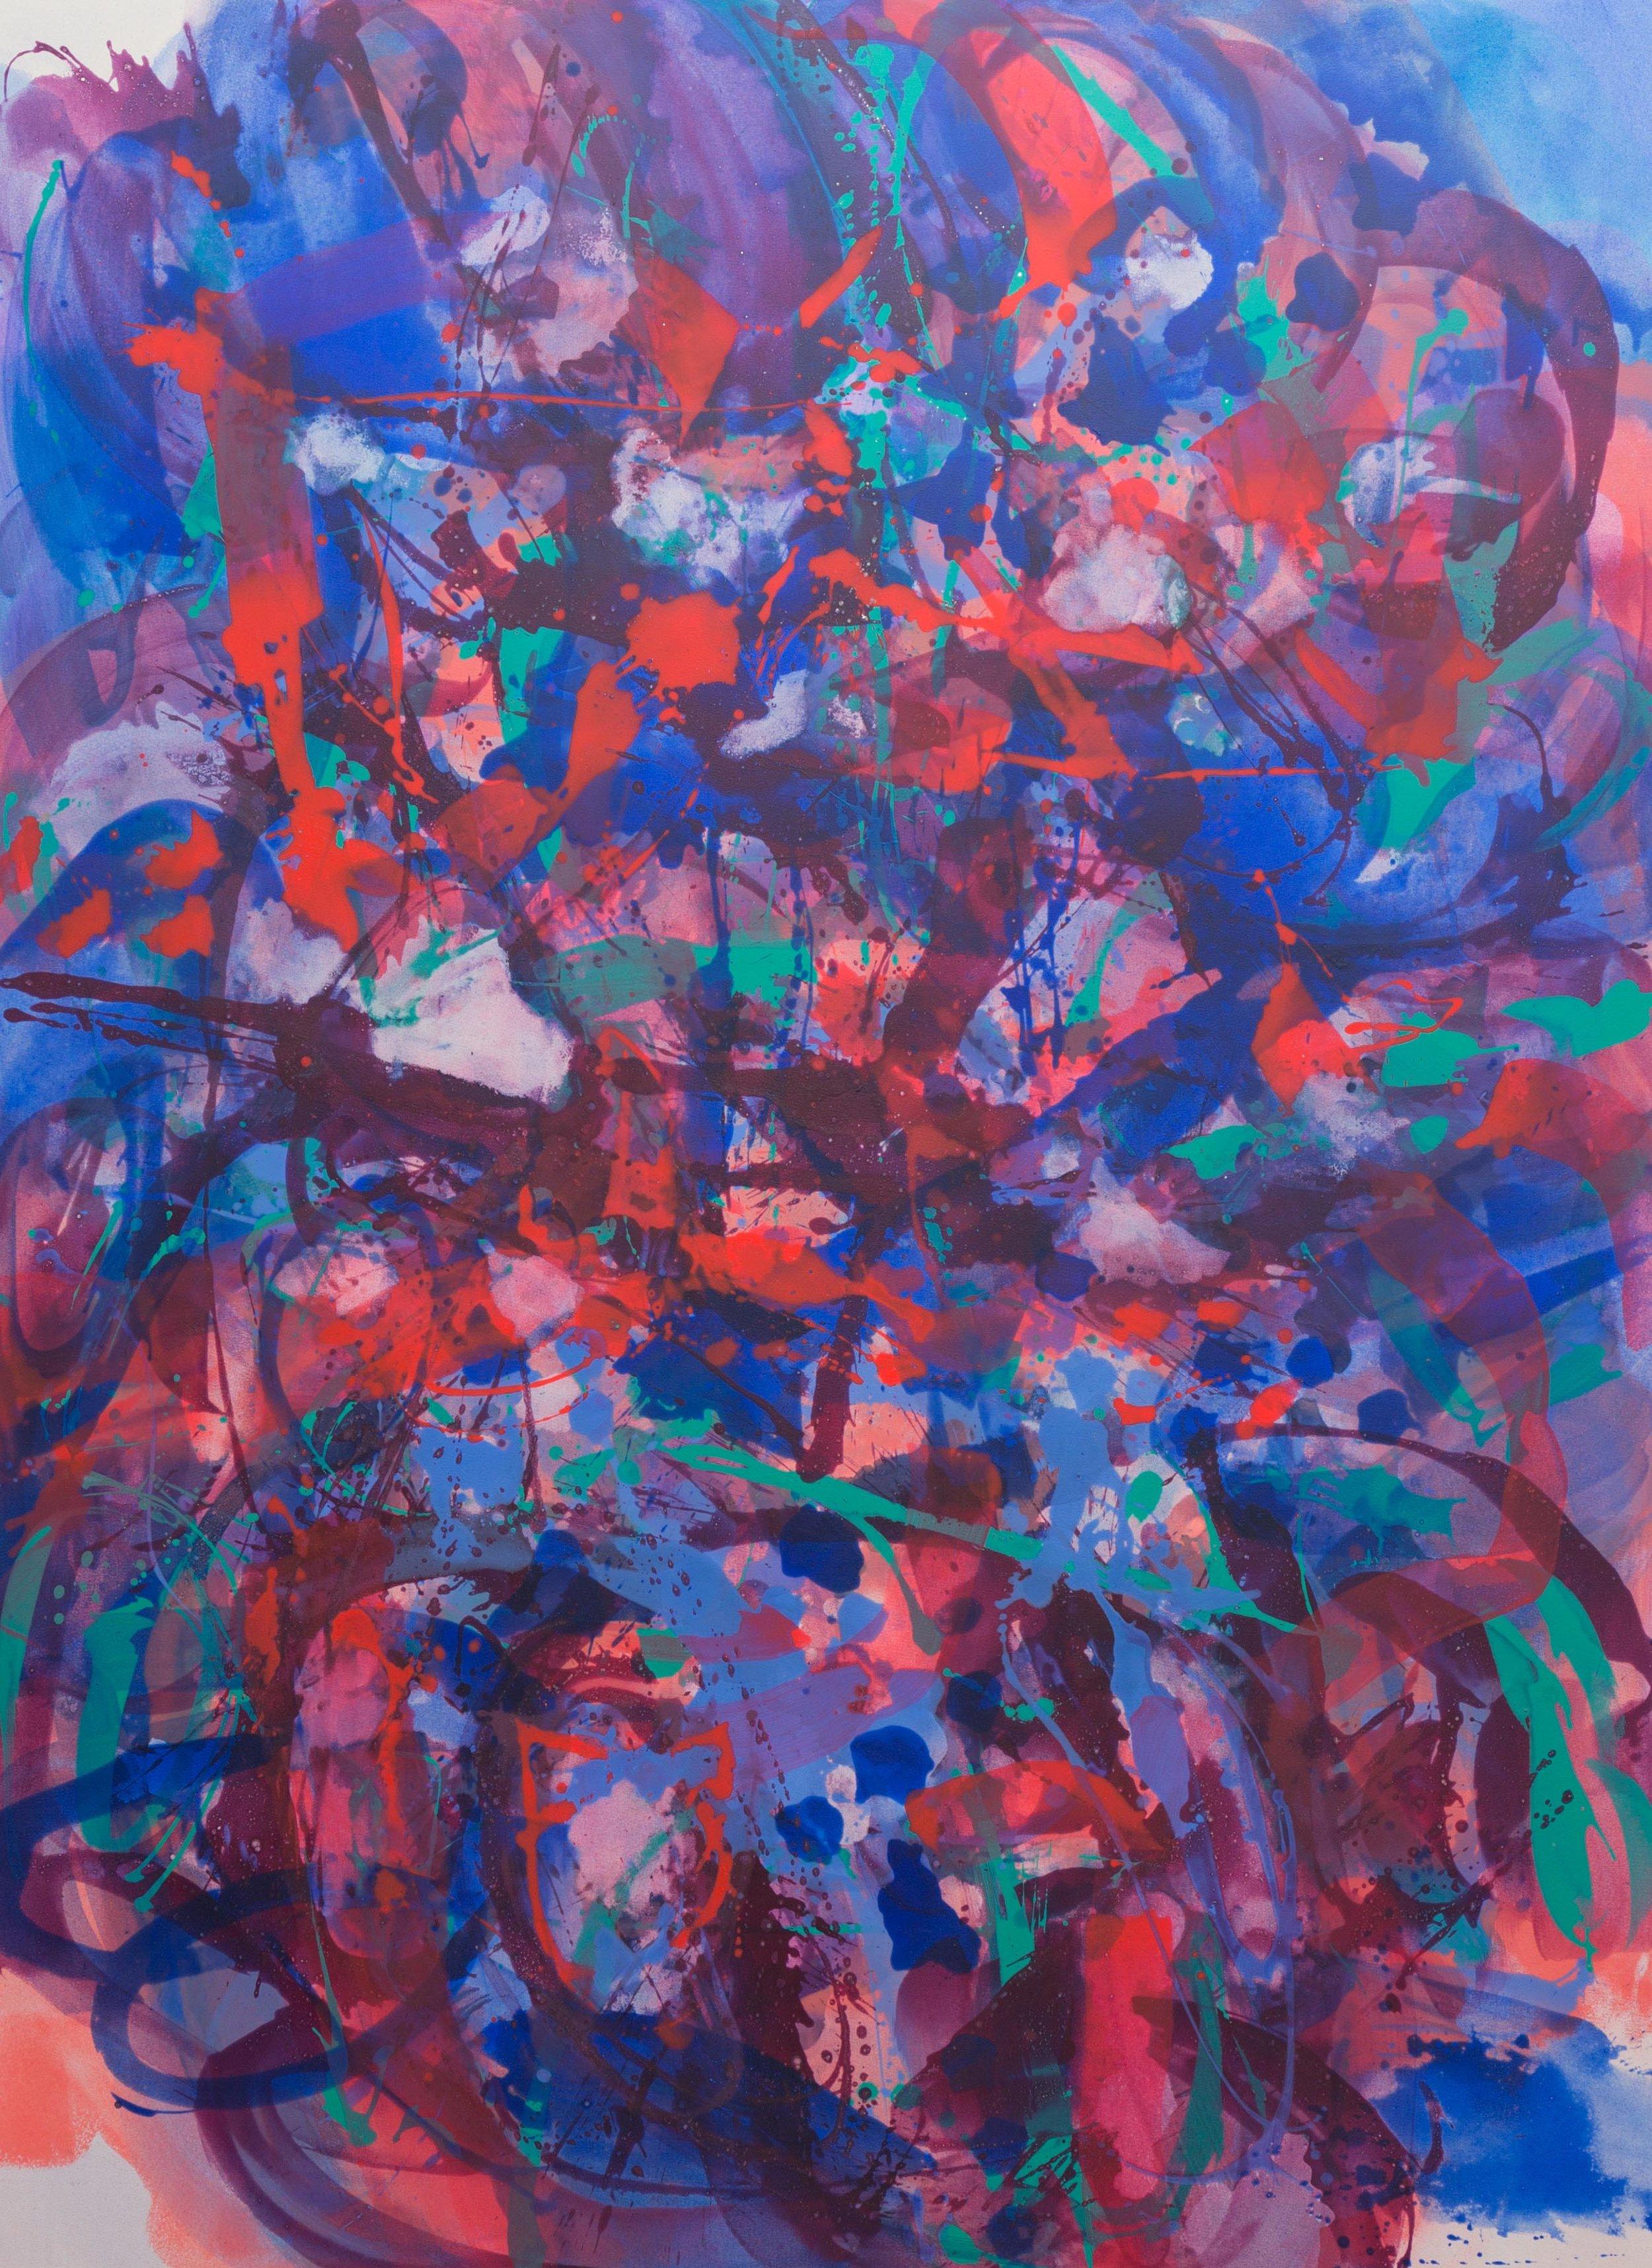 Distemper Composition IV  2019  distemper on canvas  (pure pigment, rabbit skin glue)  198 x 145 cm